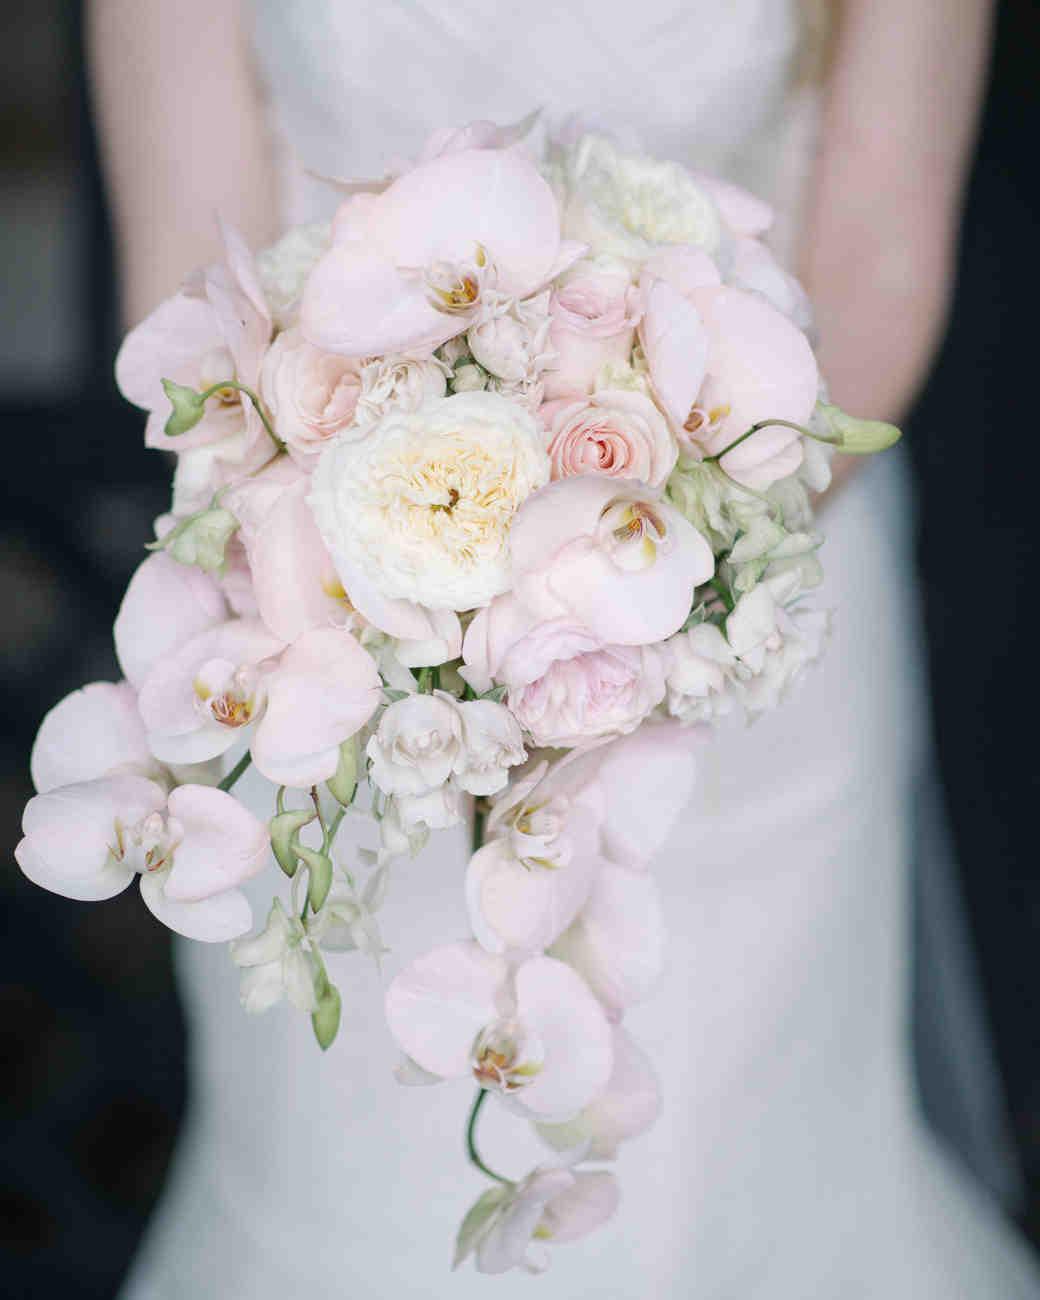 Simple Wedding Bouquet Of Flowers: 16 Impressive Orchid Wedding Bouquets